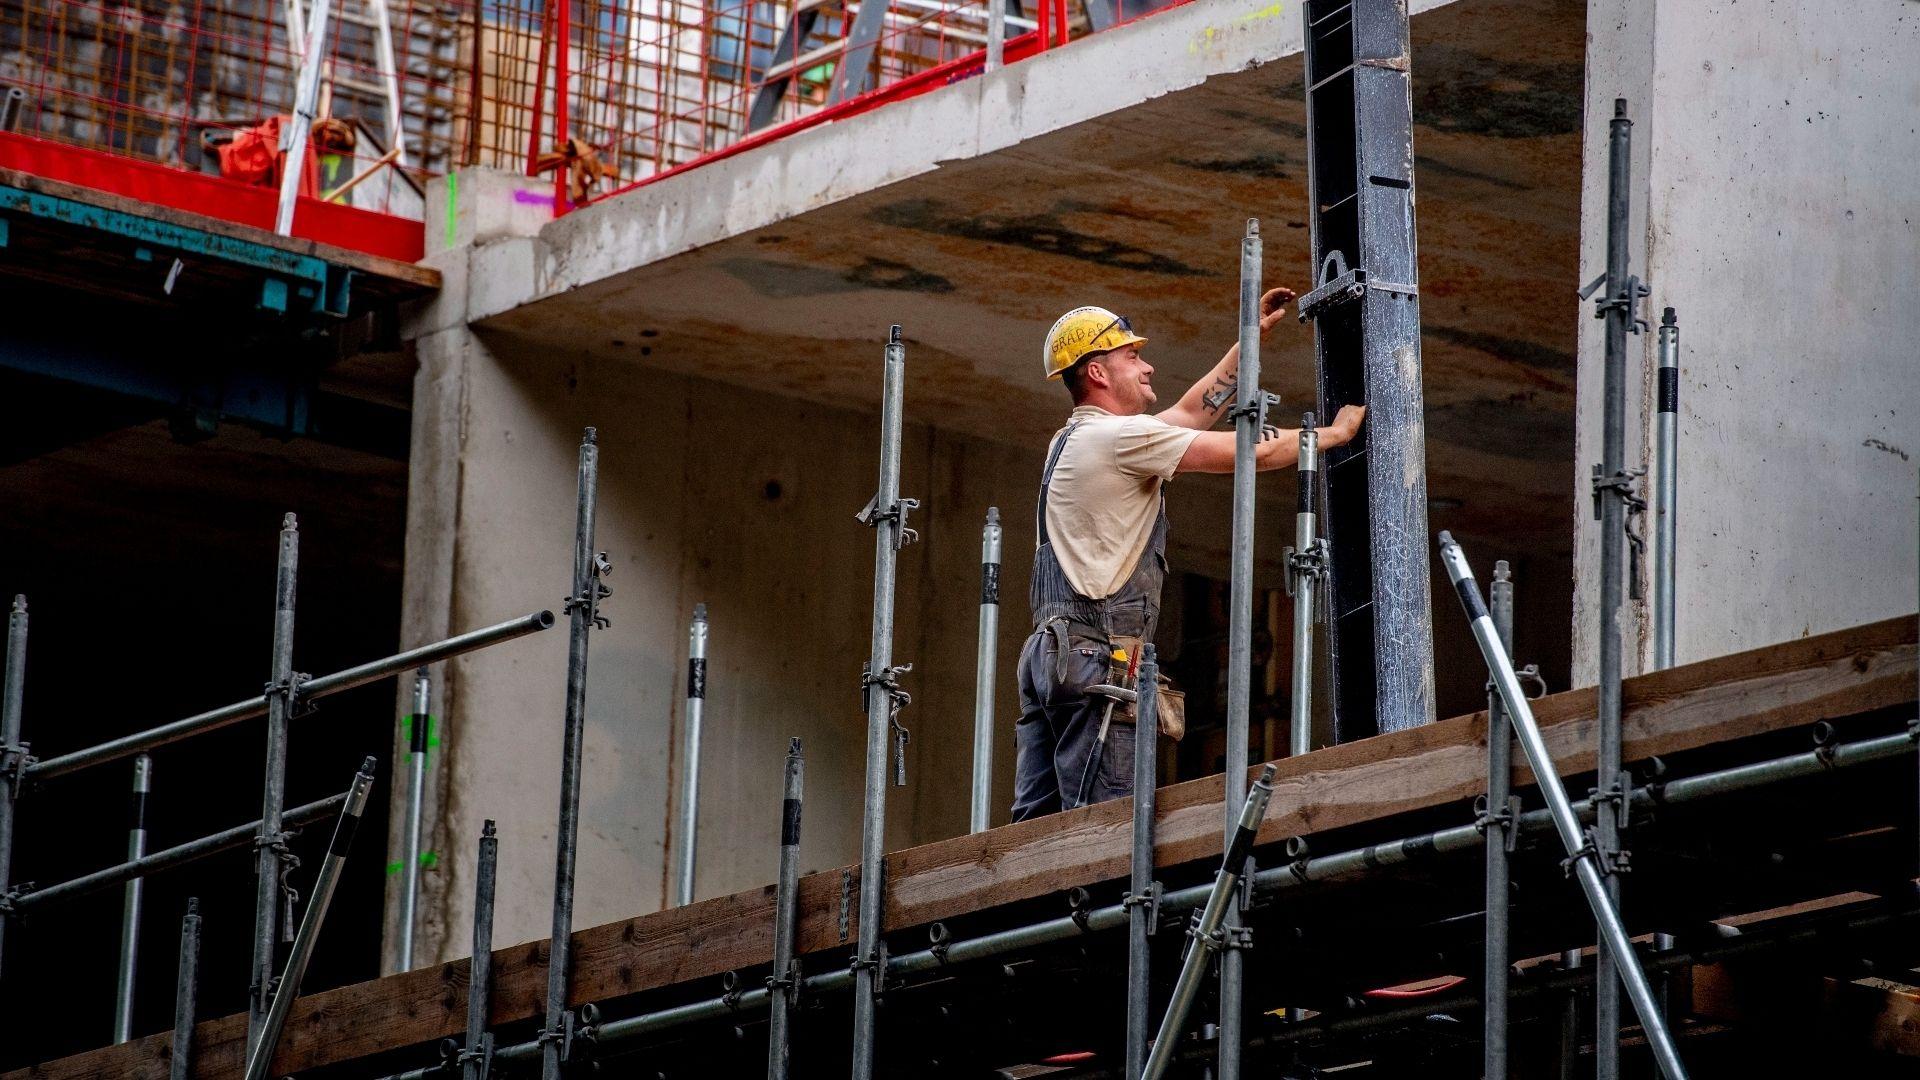 Vroegpensioen bouwvakker comeback cao vroegpensioenregelingen